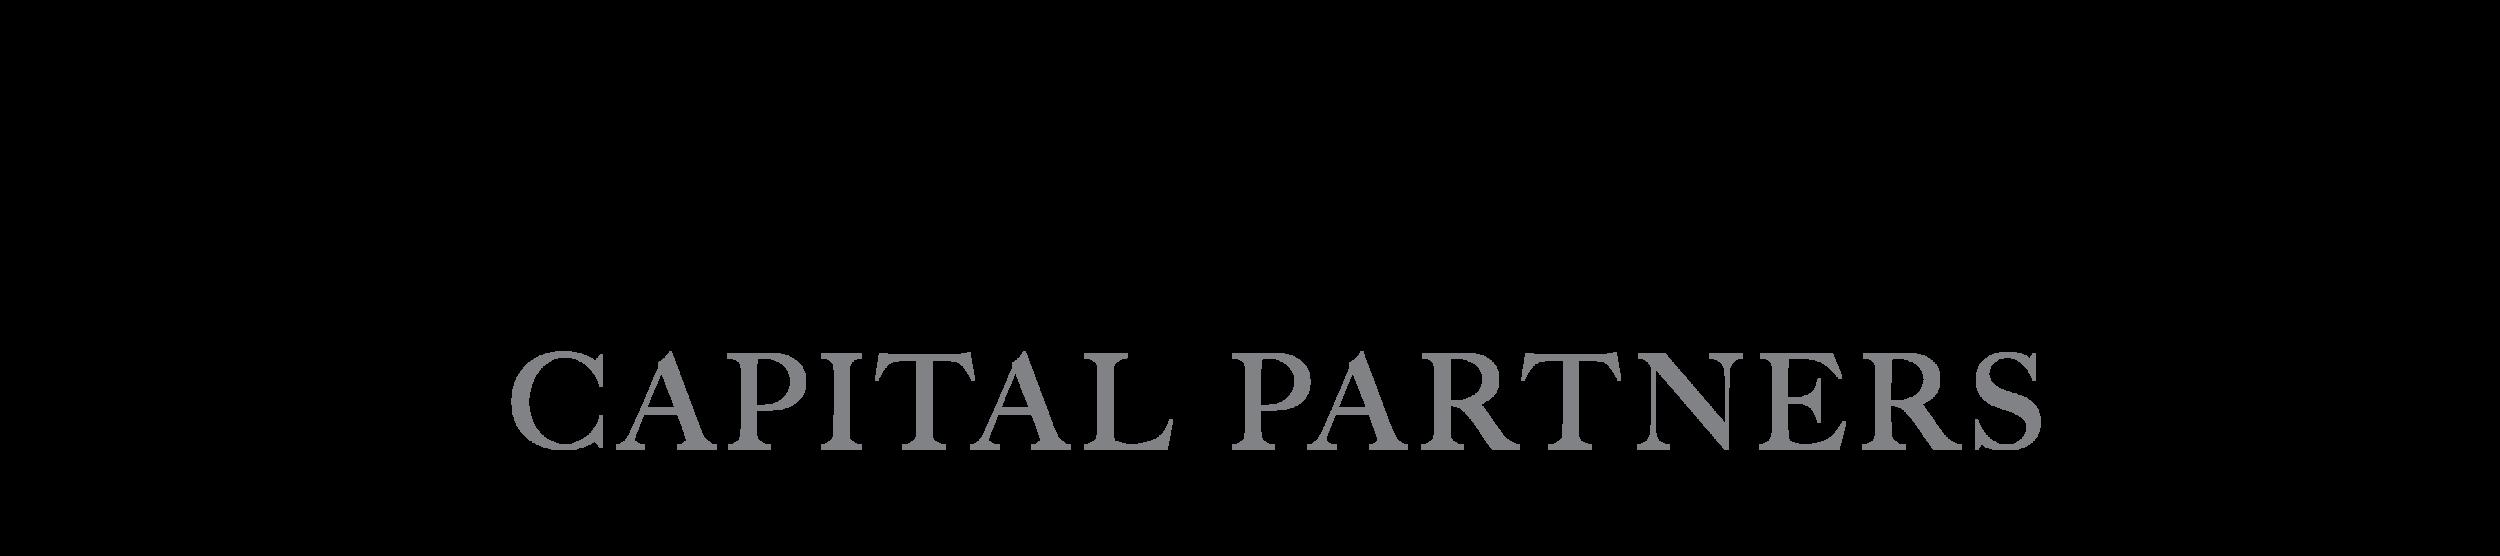 smaller_highland-logo copy.png